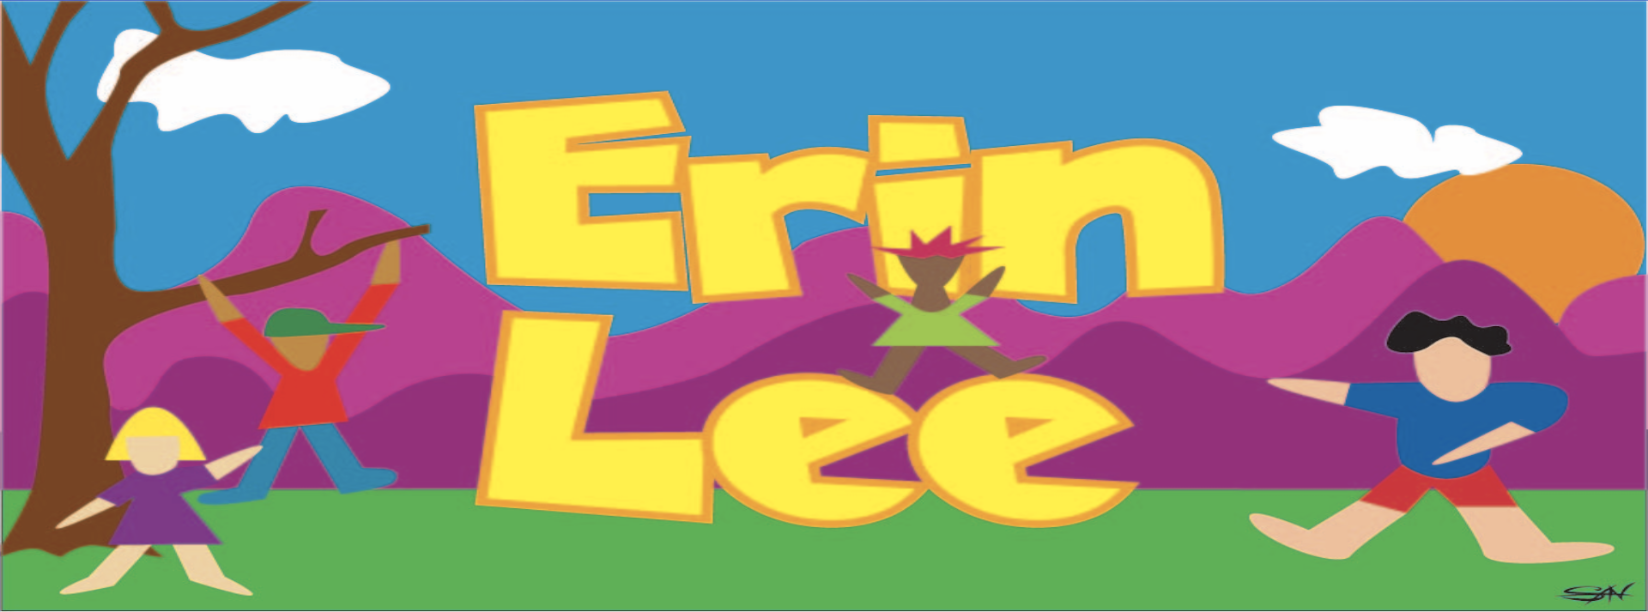 Erin Lee Art Stretched